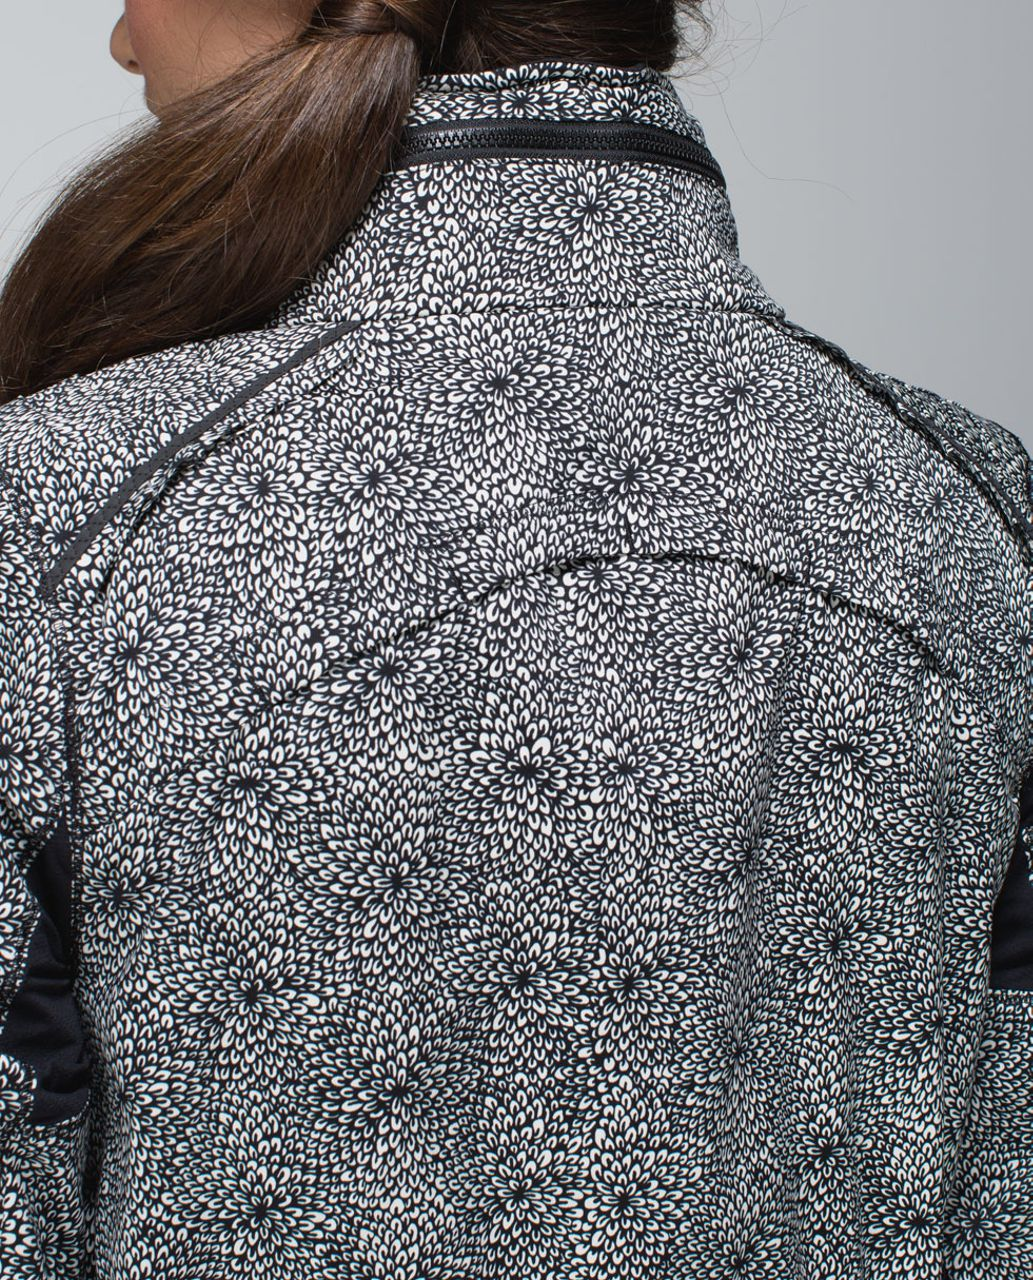 Lululemon Spring Forward Jacket - Plush Petal Black Ghost / Black